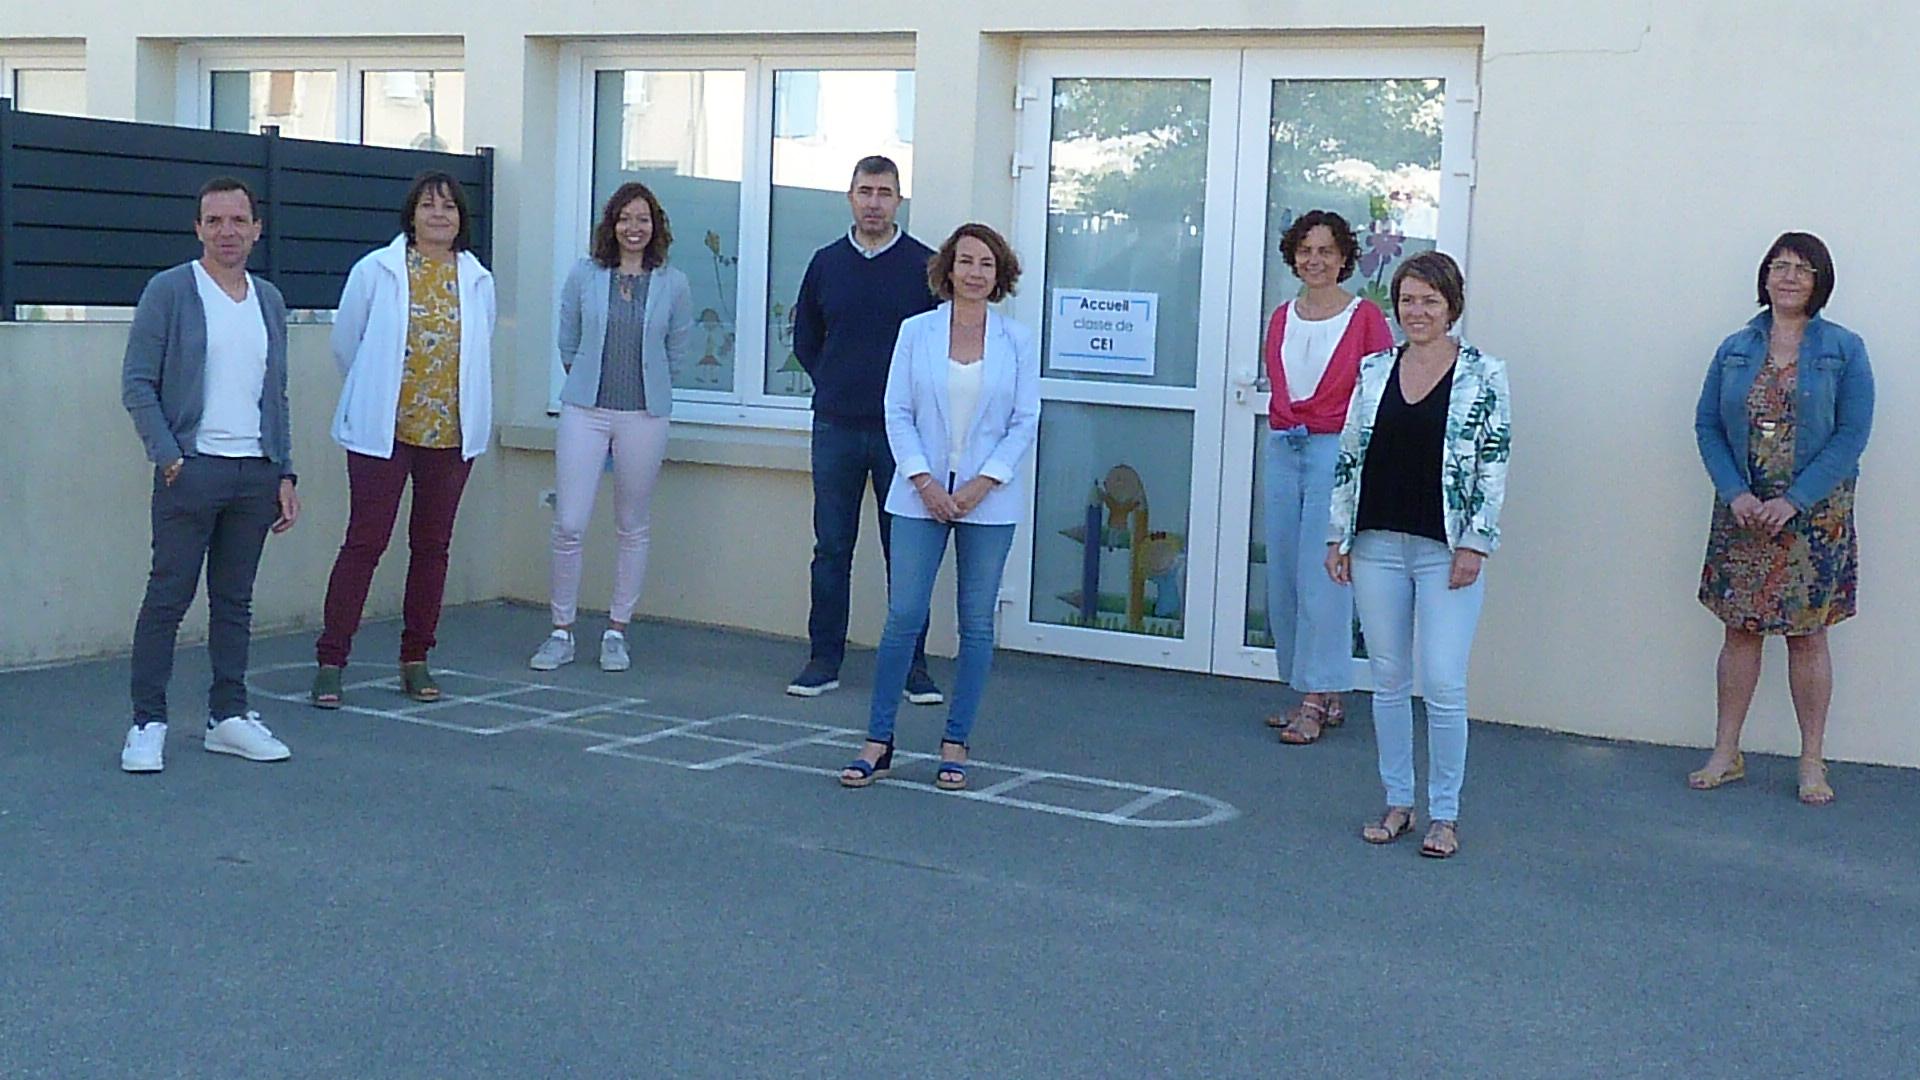 Ecole St Maurice Enseignants